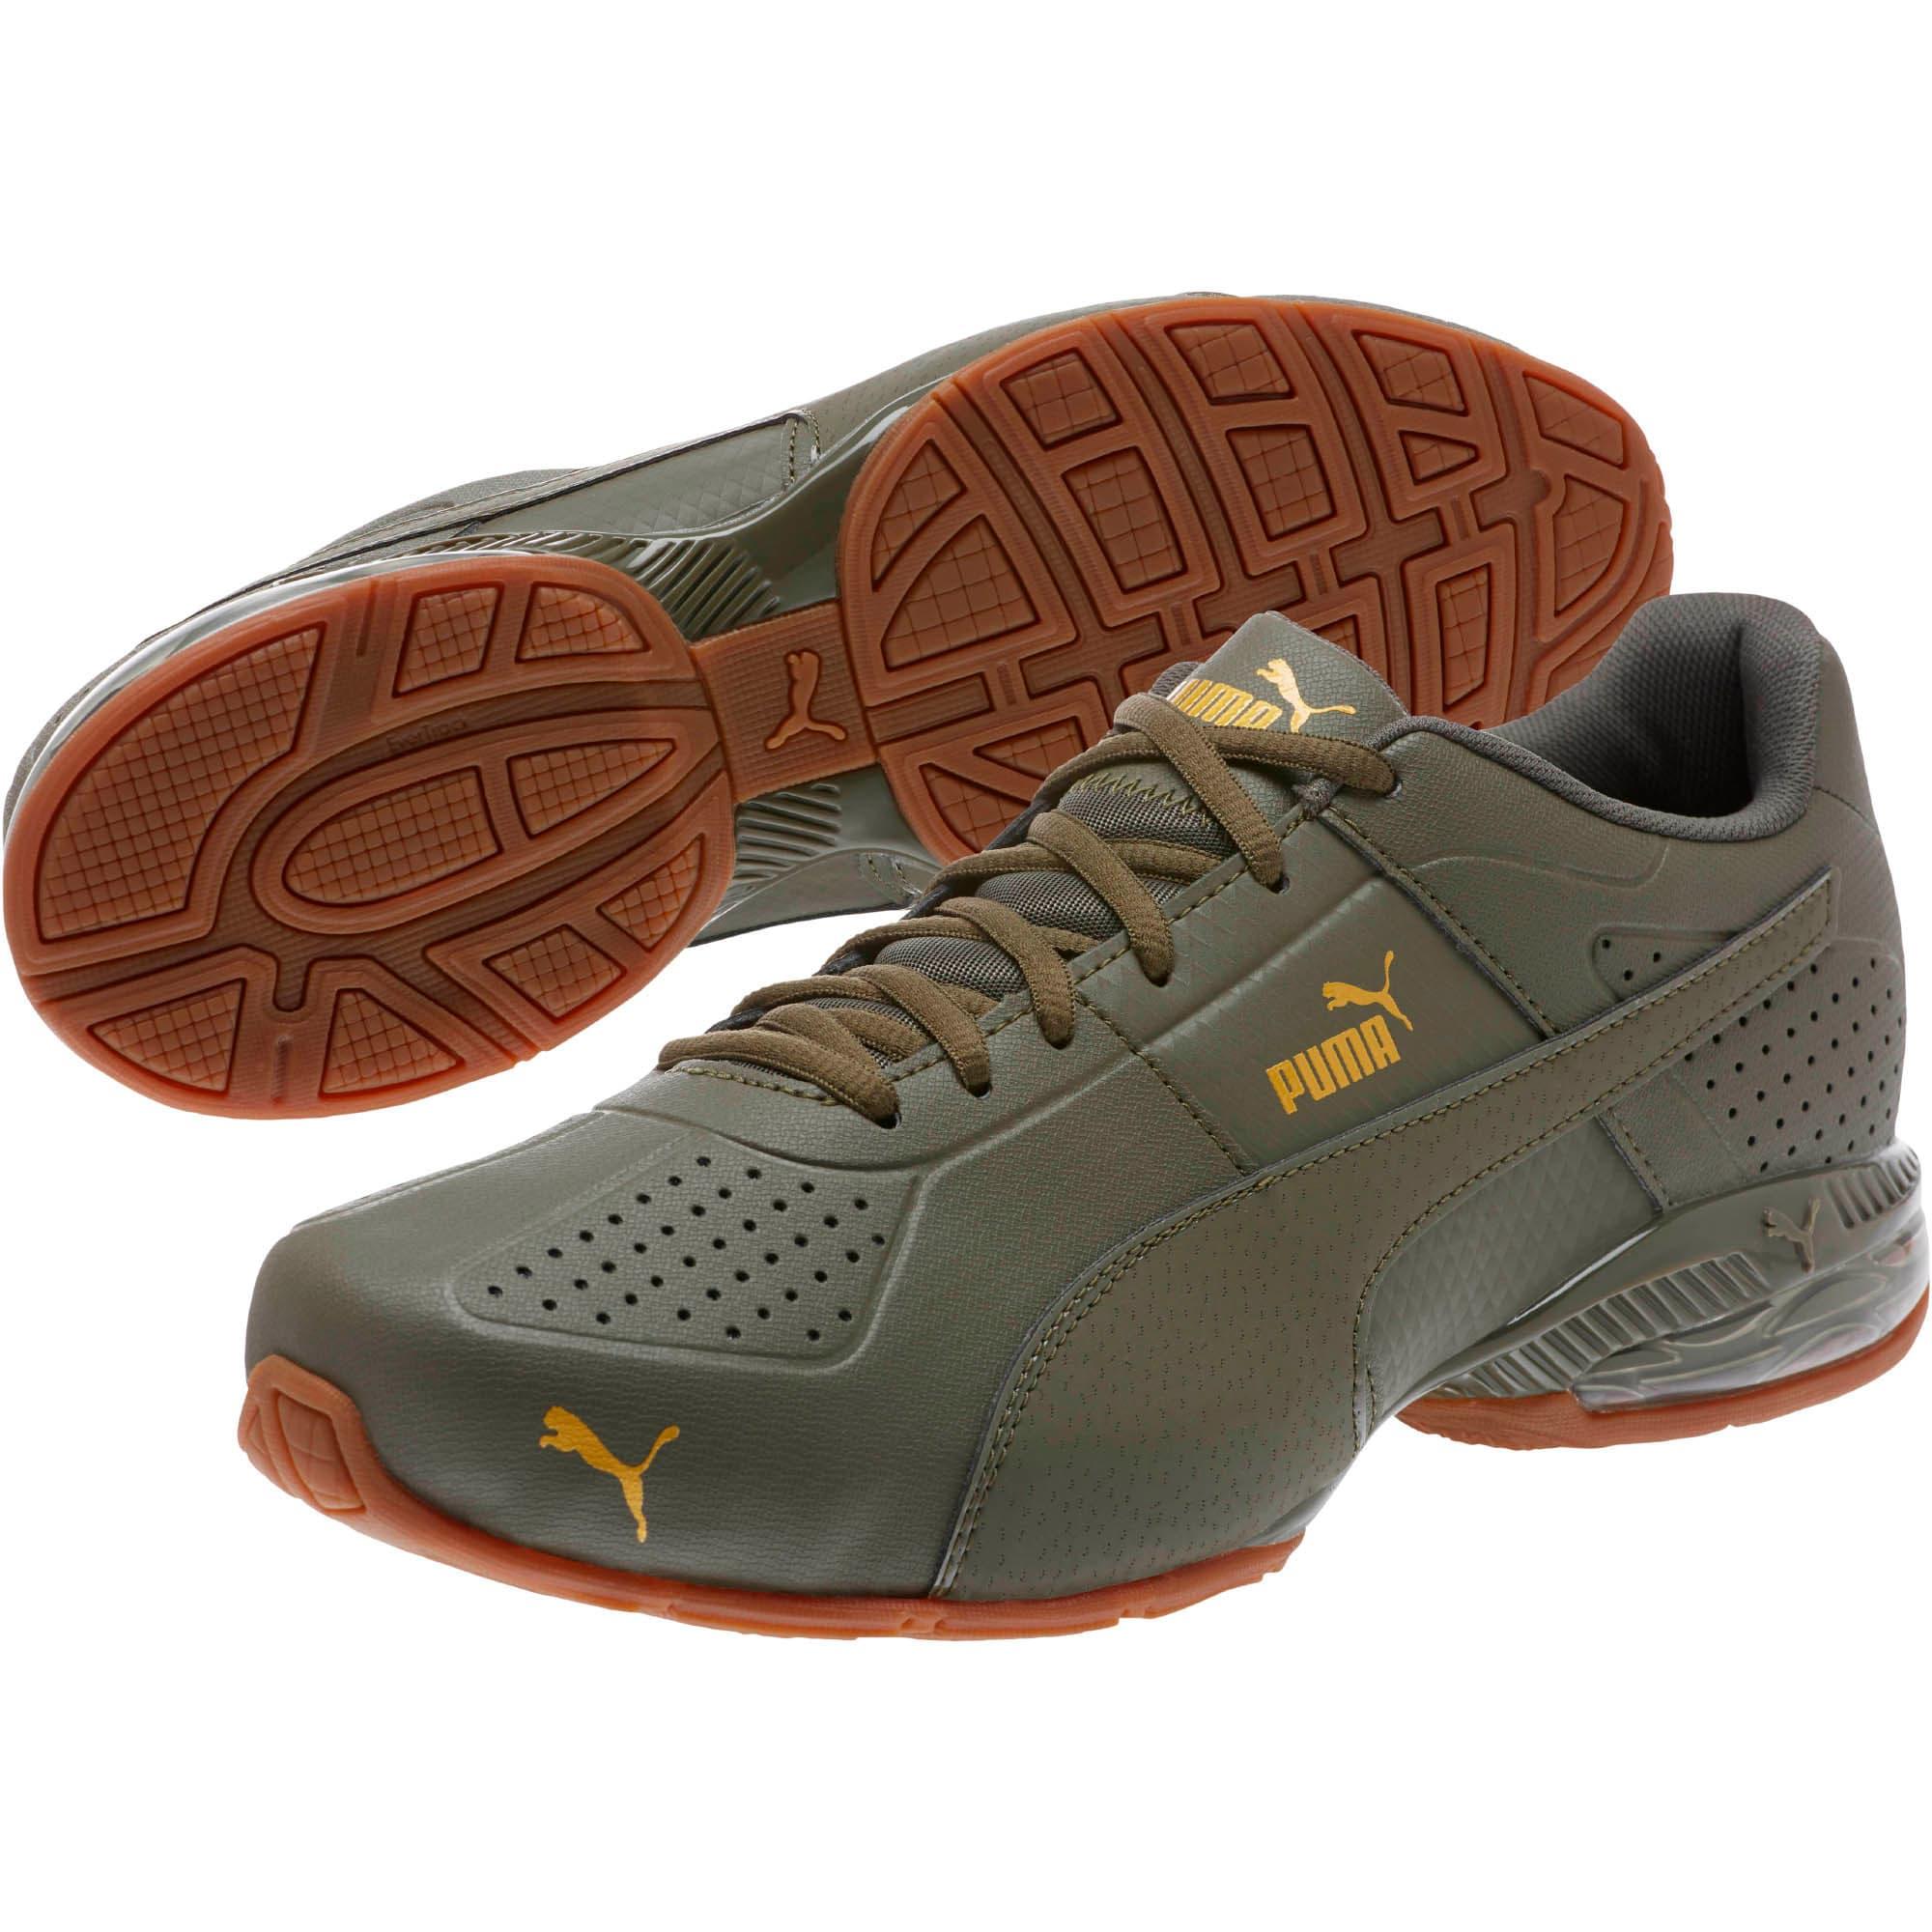 Thumbnail 2 of Cell Surin 2 Premium Men's Running Shoes, Olive Night-Gold, medium